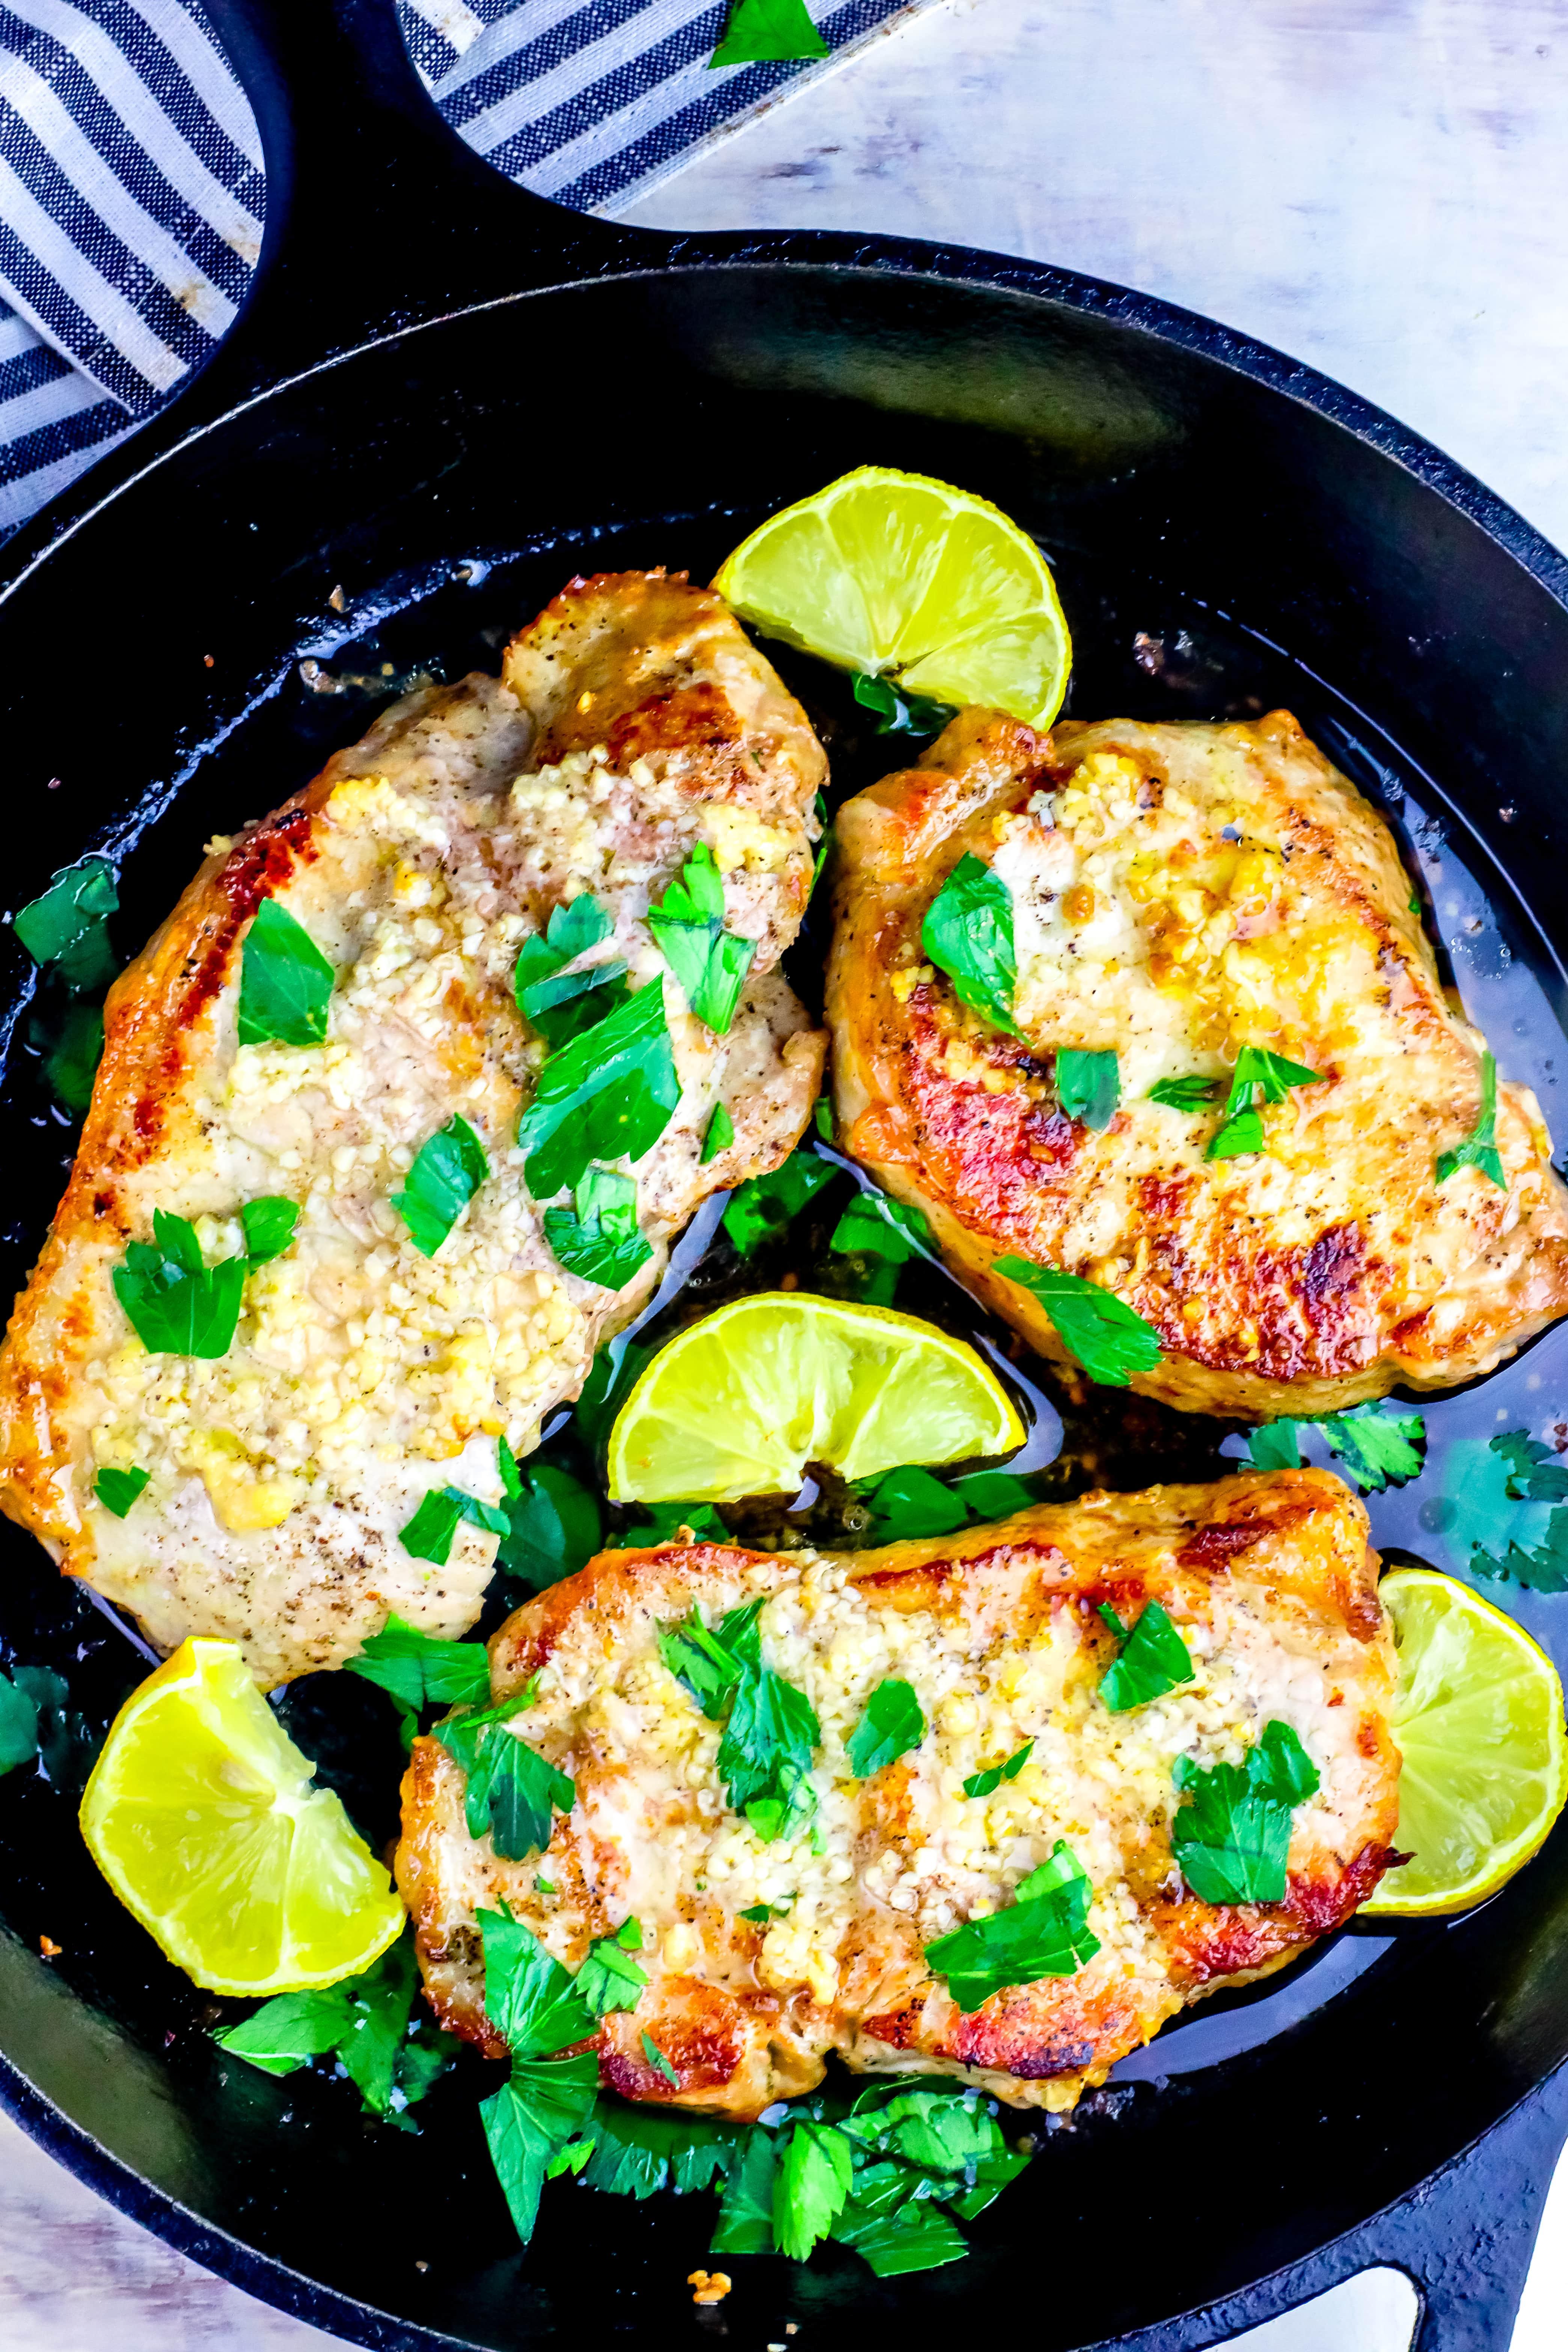 10 Amazing Ideas For Dinner With Pork Chops the best baked garlic pork chops recipe oven baked pork chops 2020